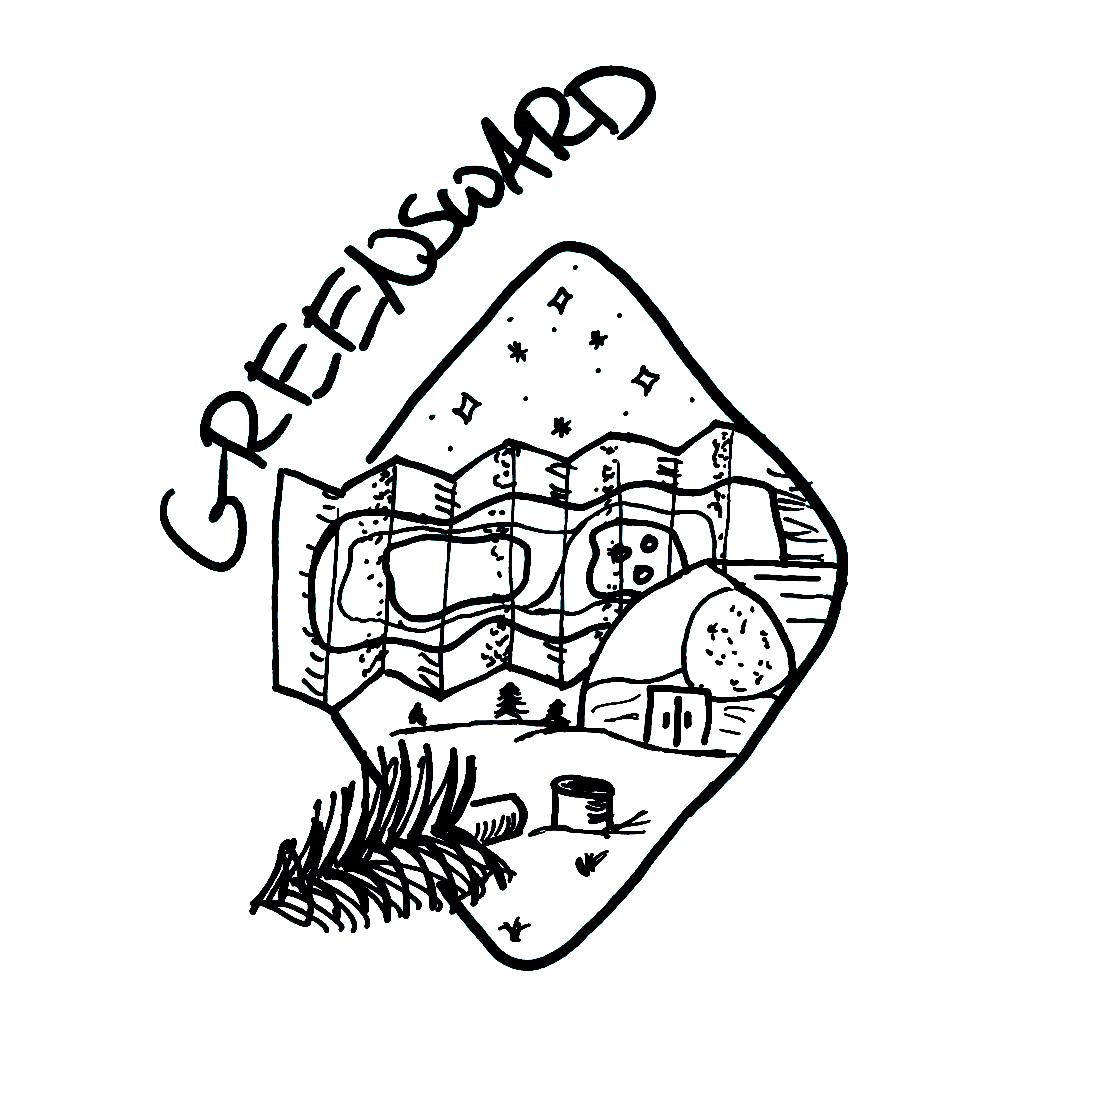 Greensward-sketch-portfolio.jpg